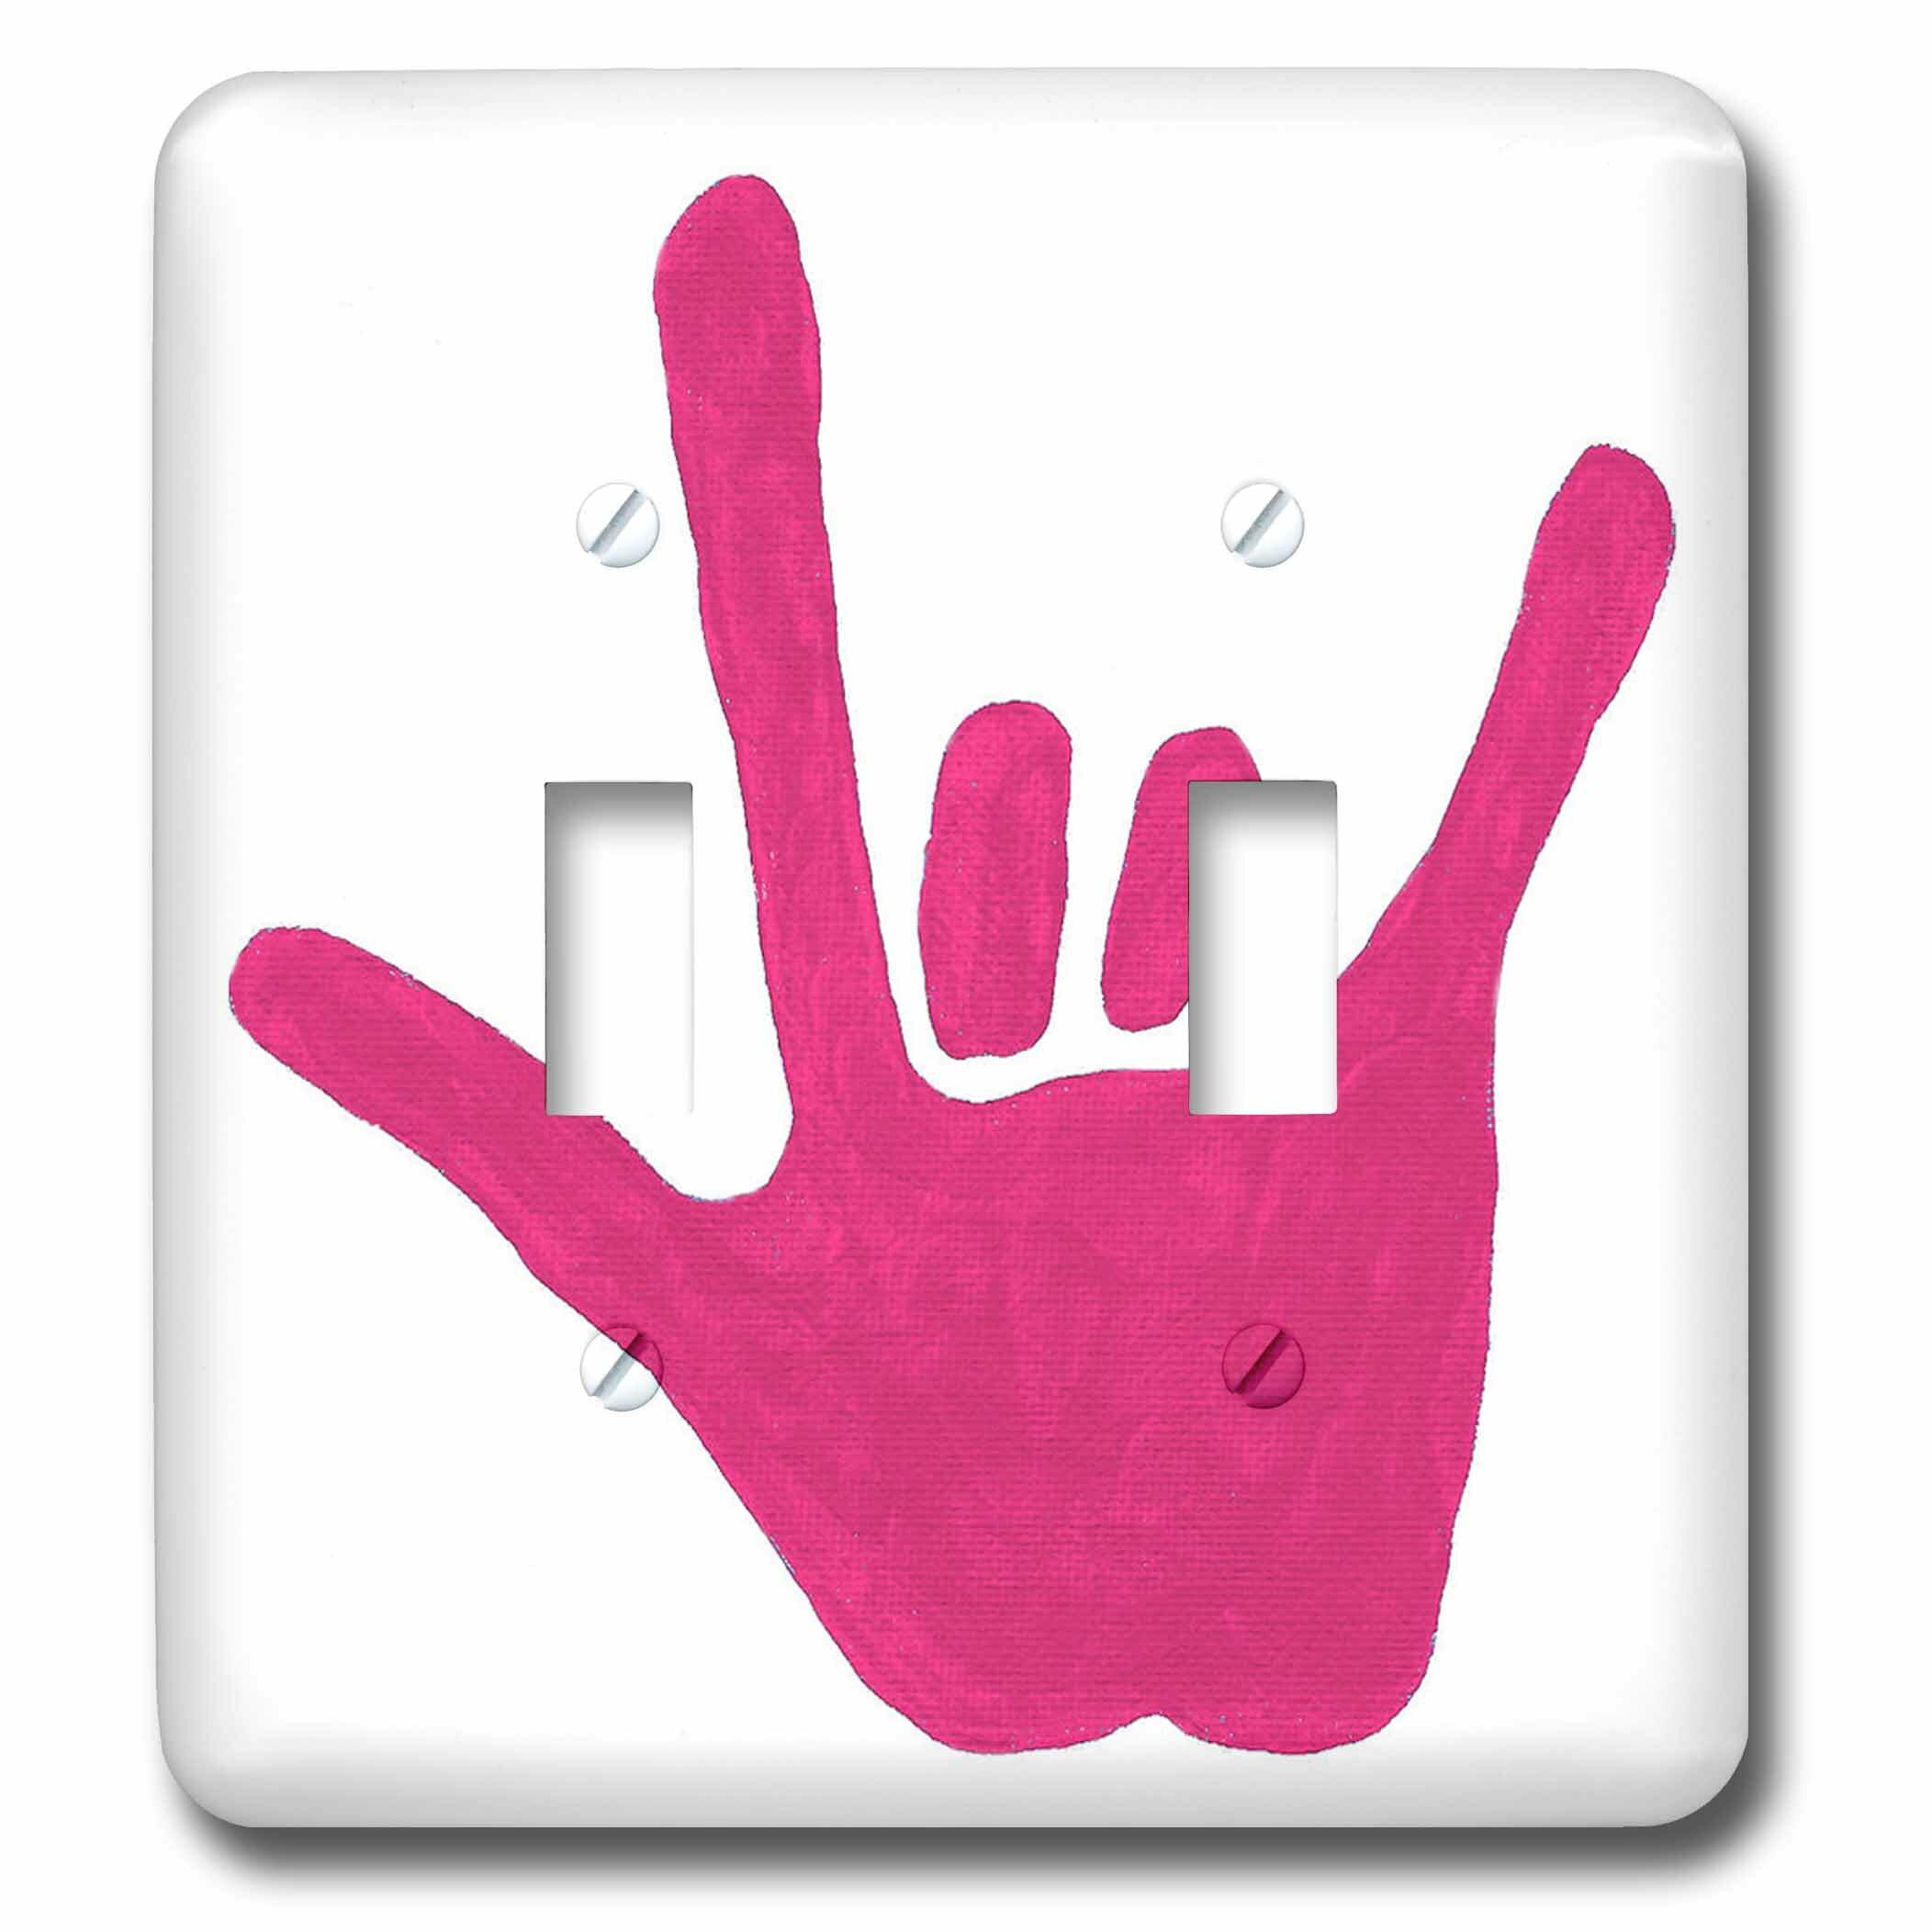 3drose Love Sign Language 2 Gang Toggle Light Switch Wall Plate Wayfair